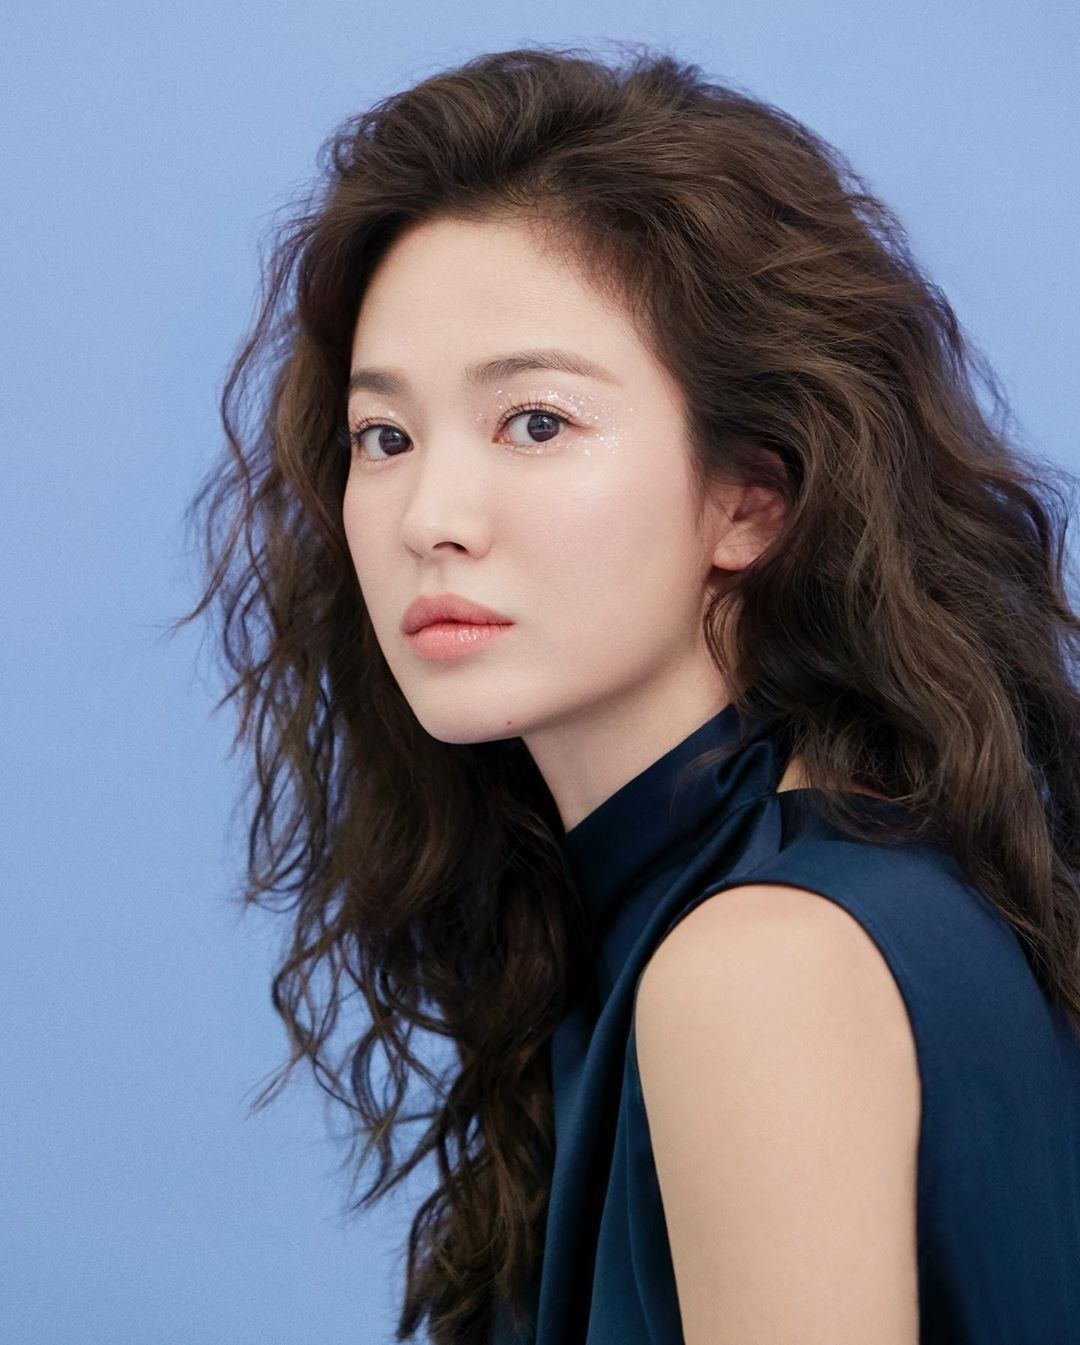 Song Hye Kyo In 2020 Song Hye Kyo Short Hair Styles Korean Actresses